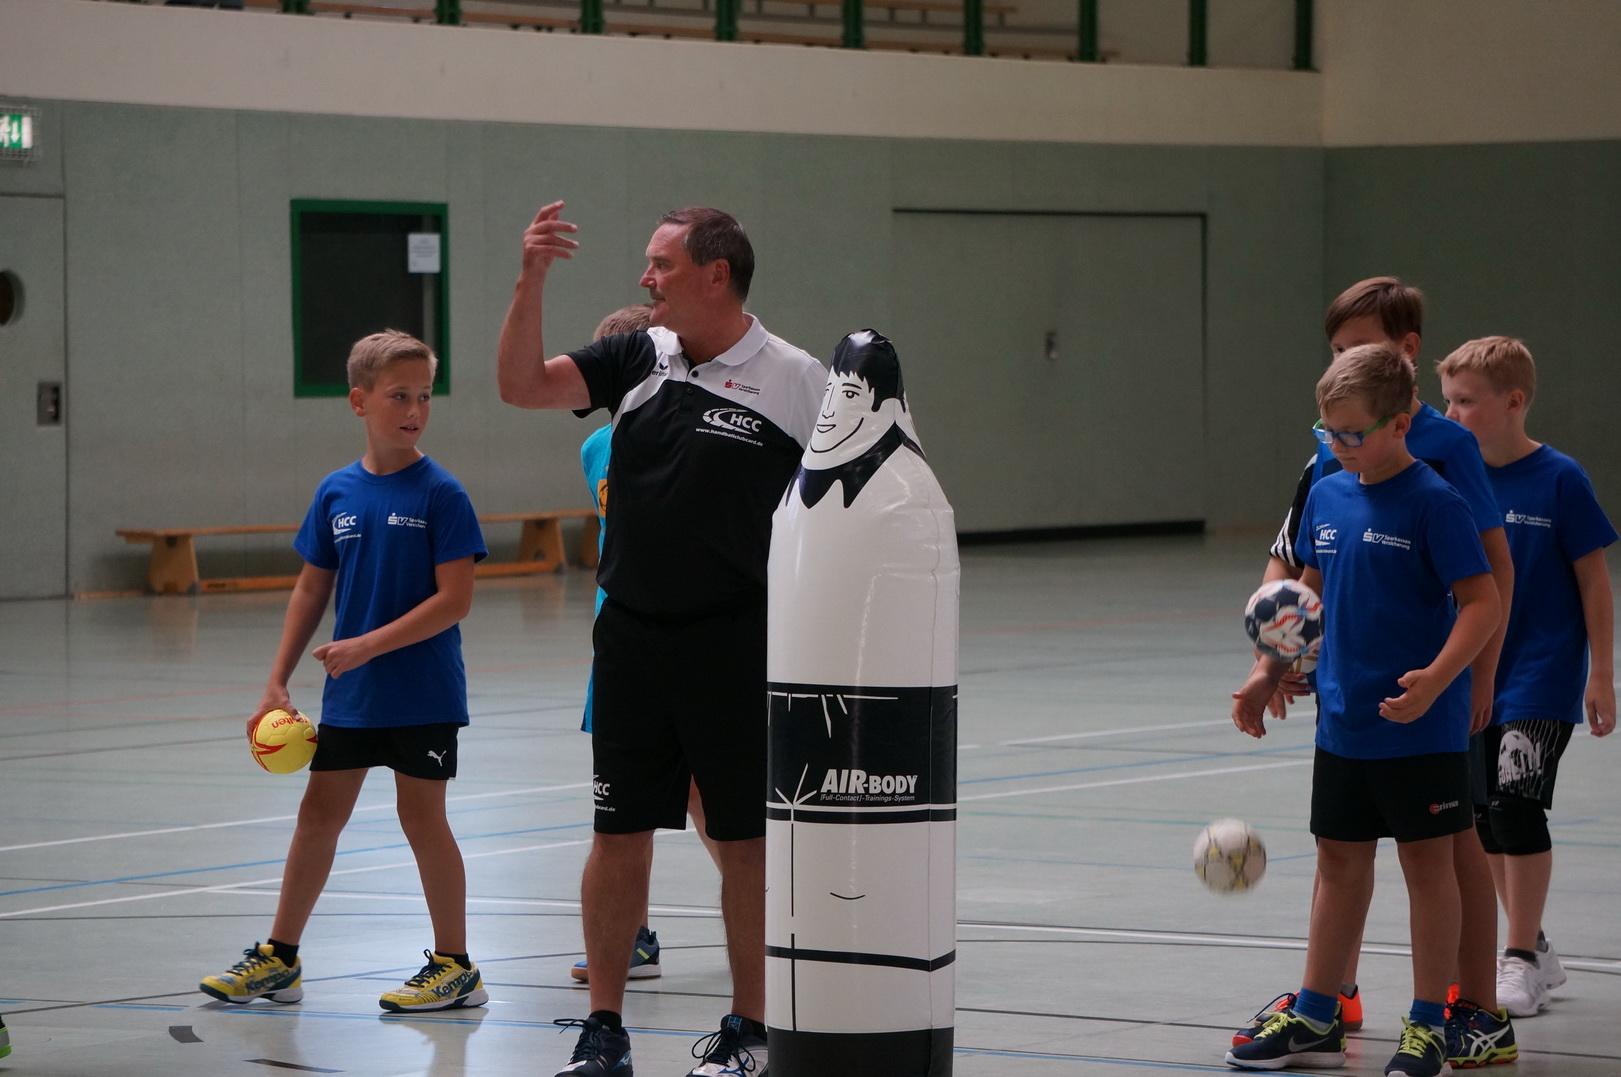 201808_Handballcamp_SDH_MG_229w